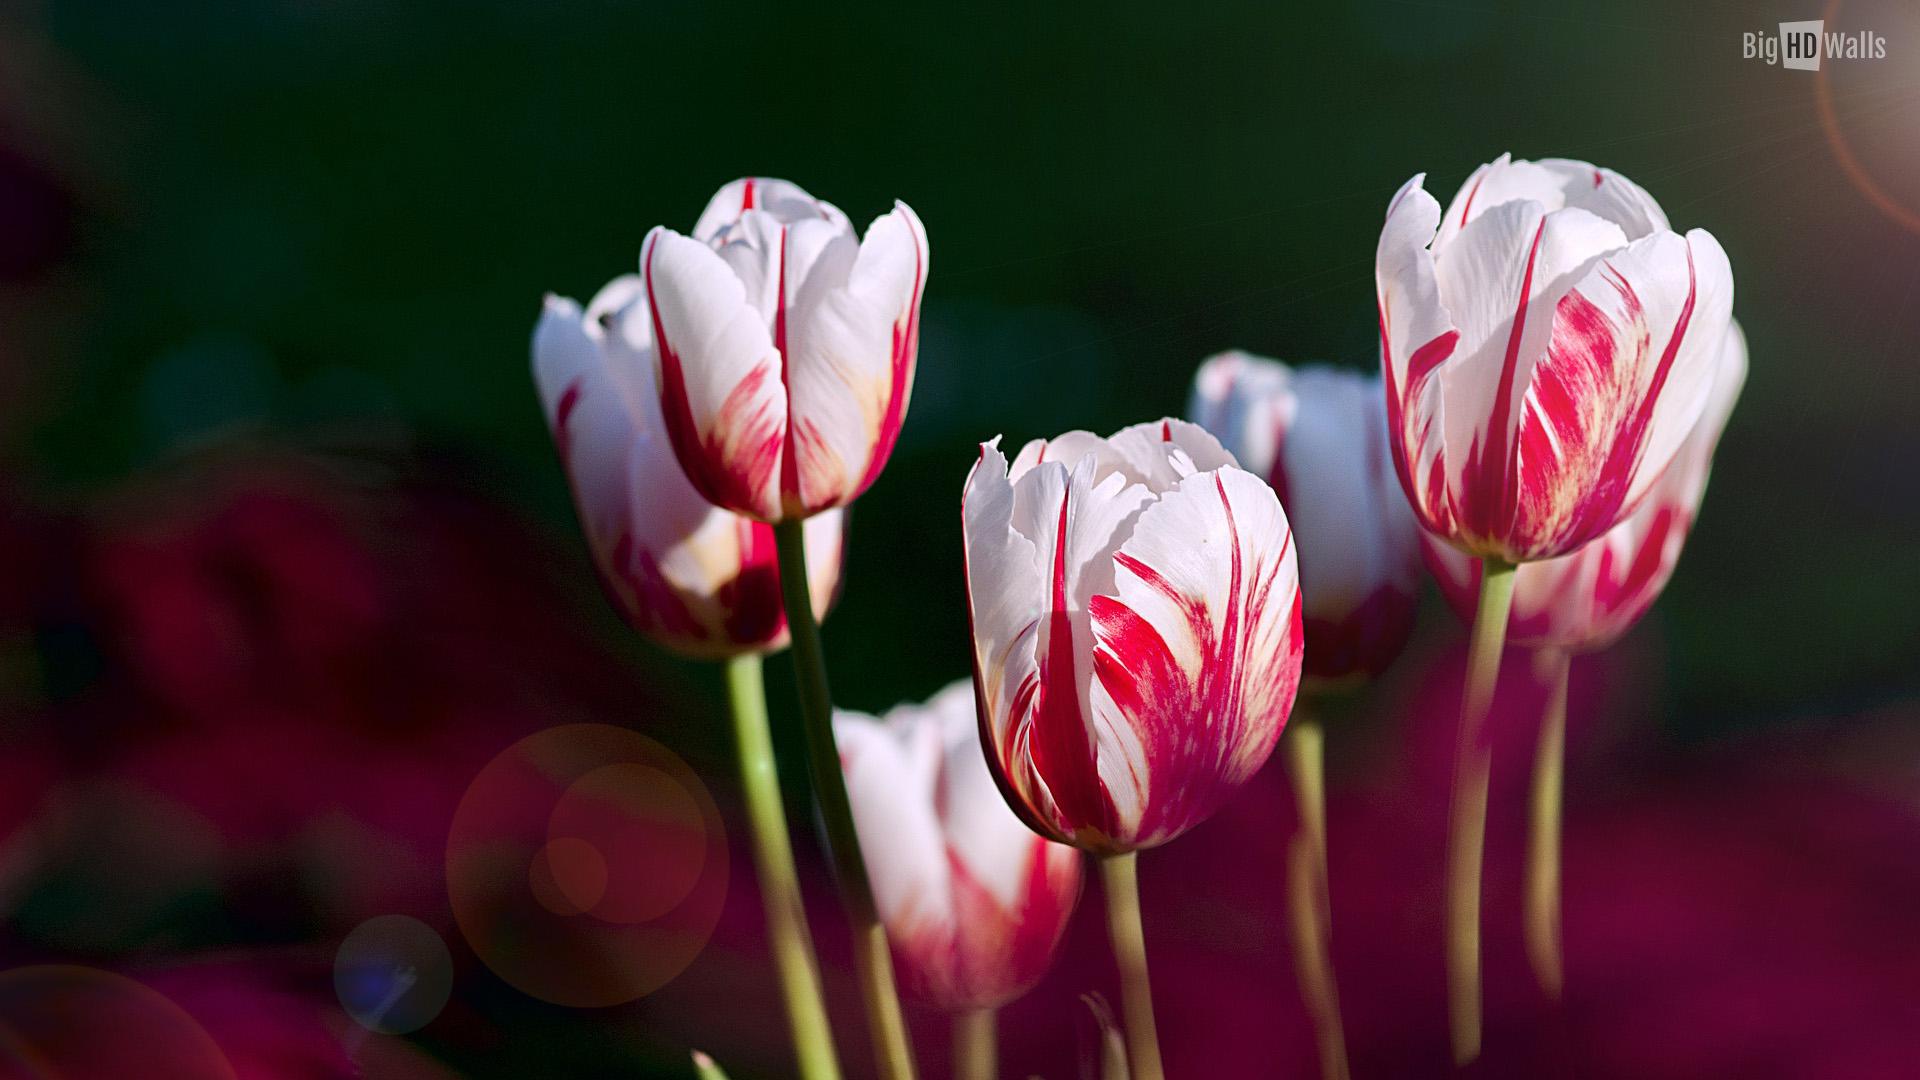 [72+] Tulip Flowers Wallpapers On WallpaperSafari